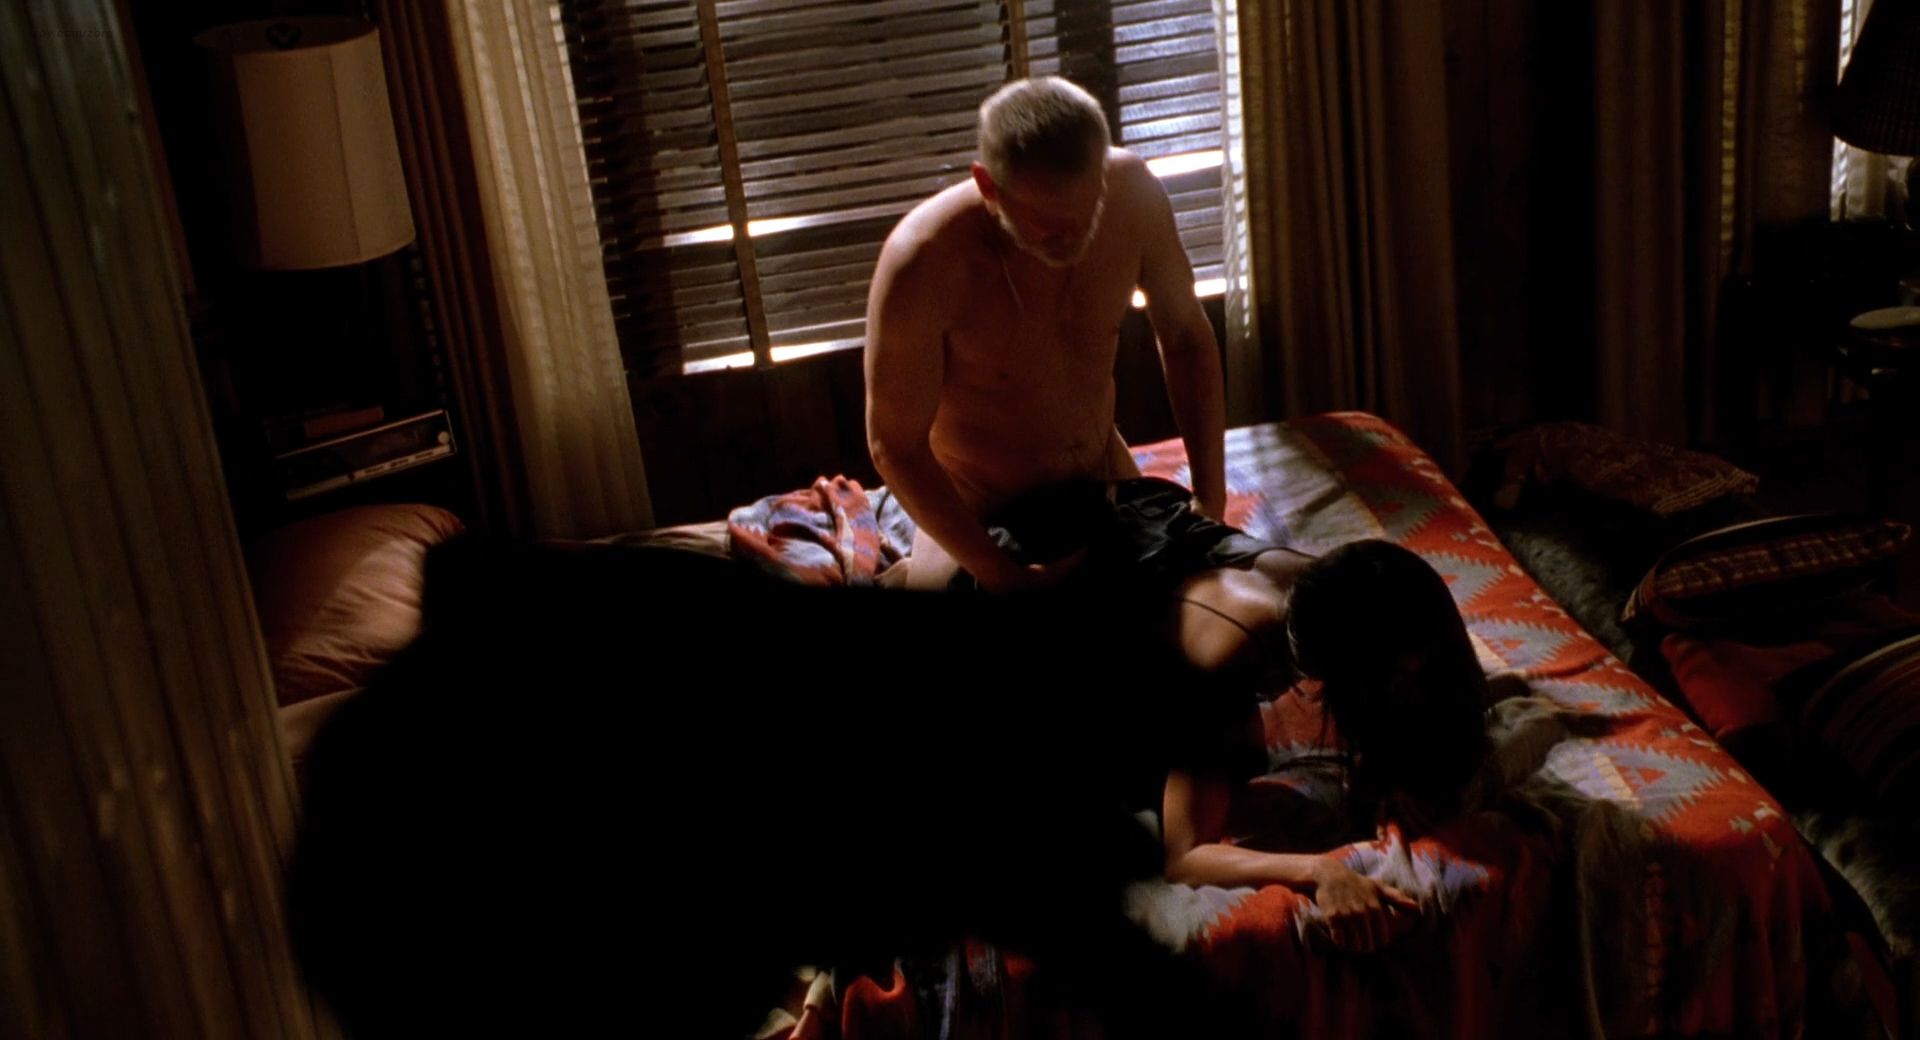 Jennifer lopez u turn sex scene